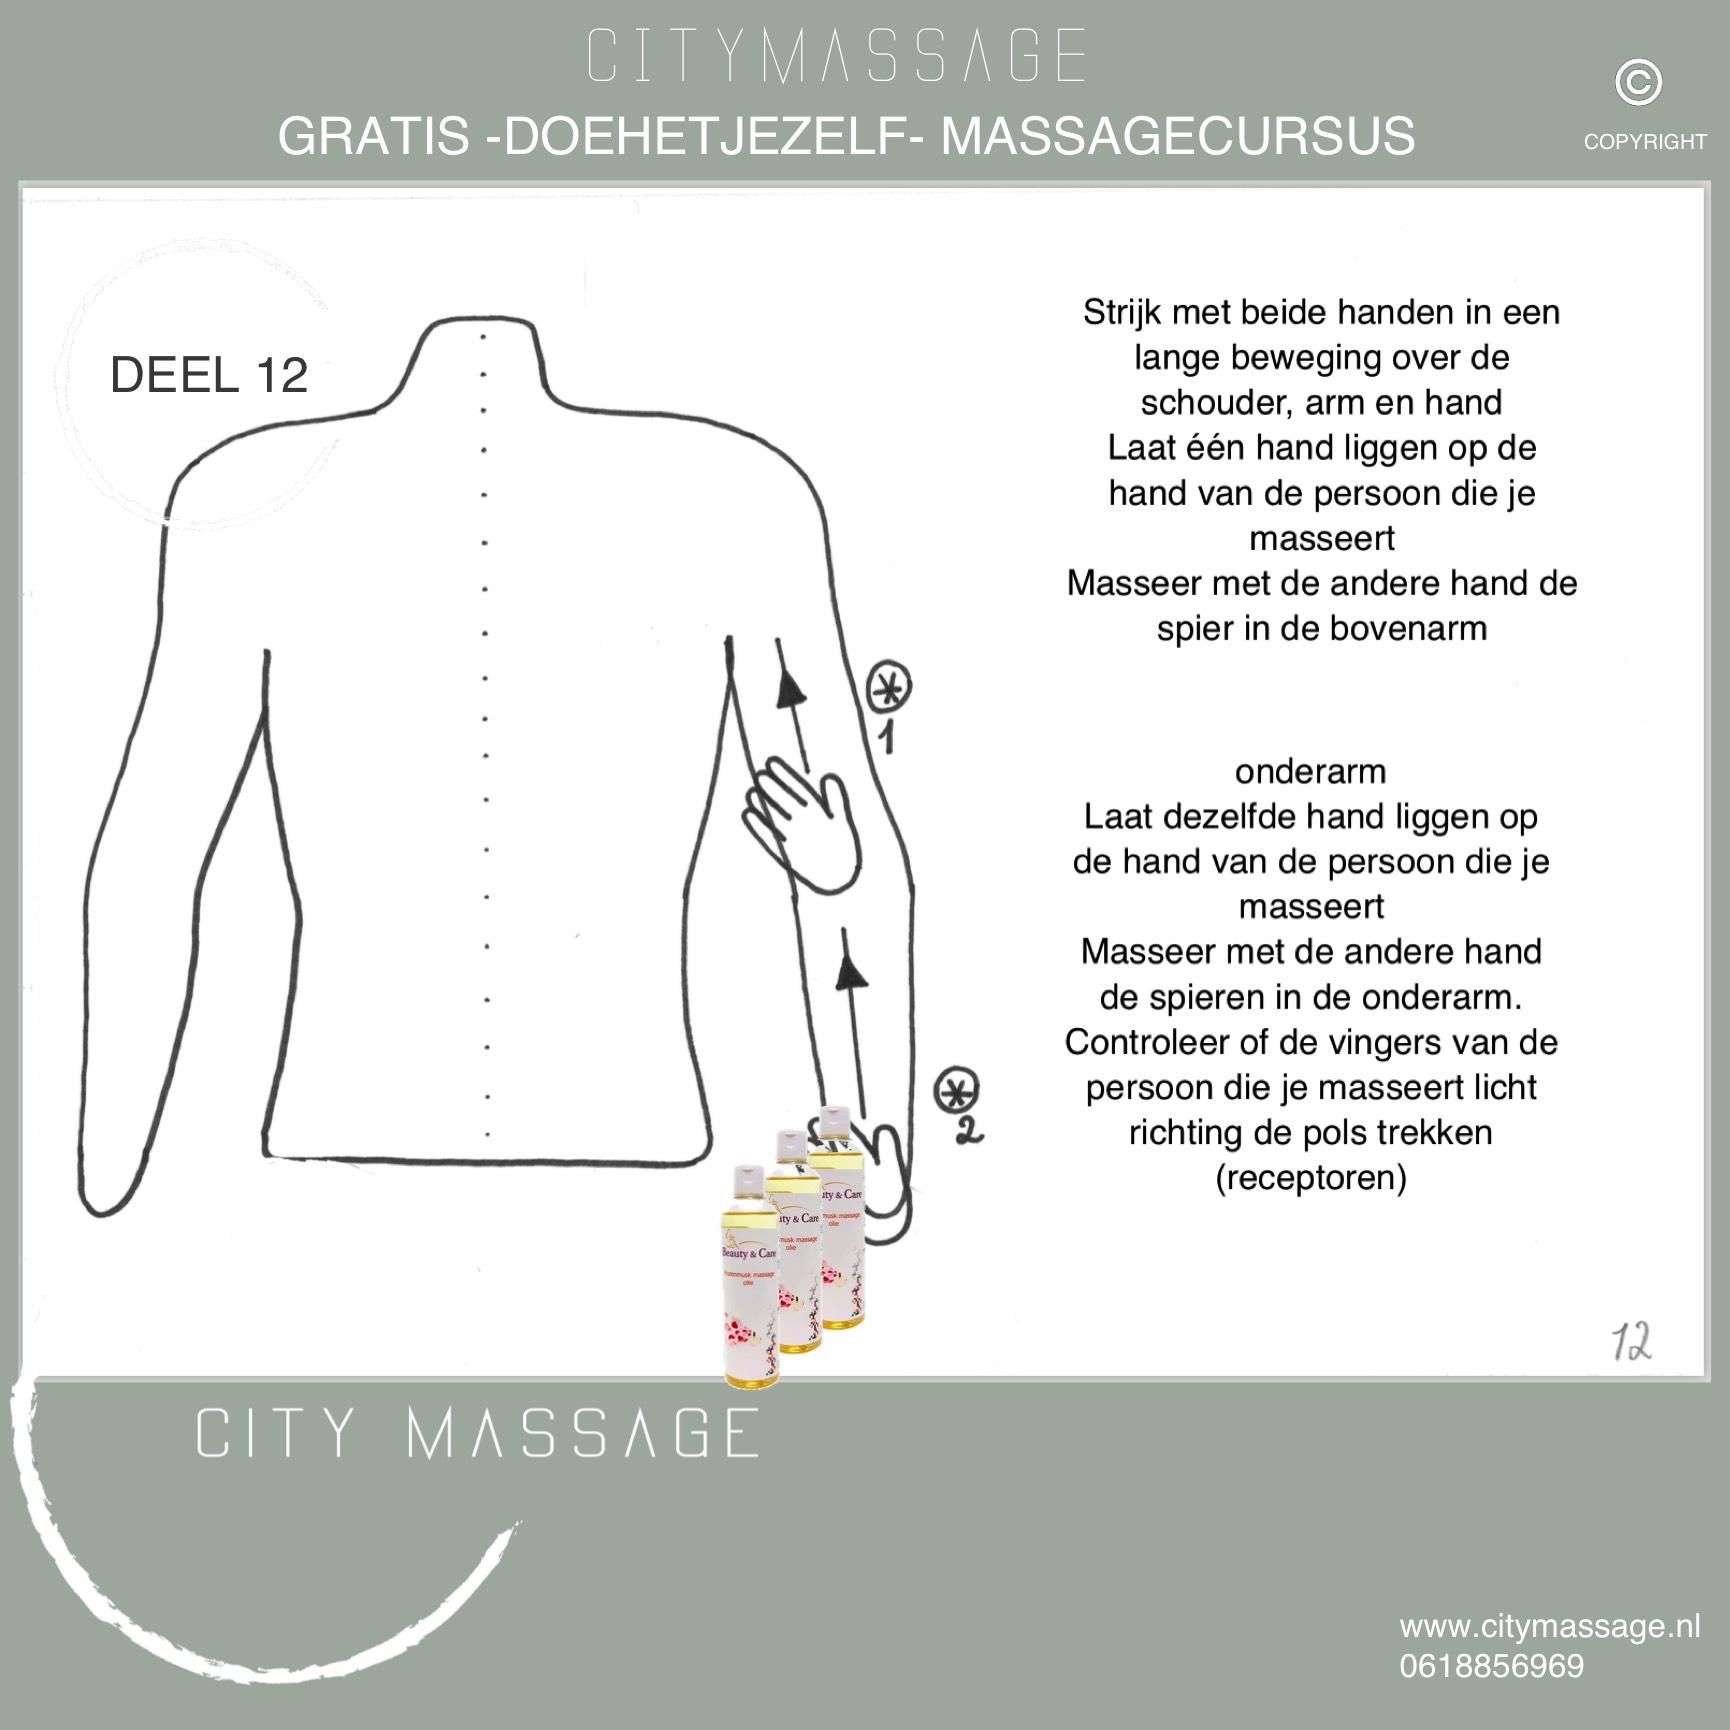 DOEHETJEZELF gratis massagecursus 12 City Massage Tilburg ontspanningsmassage